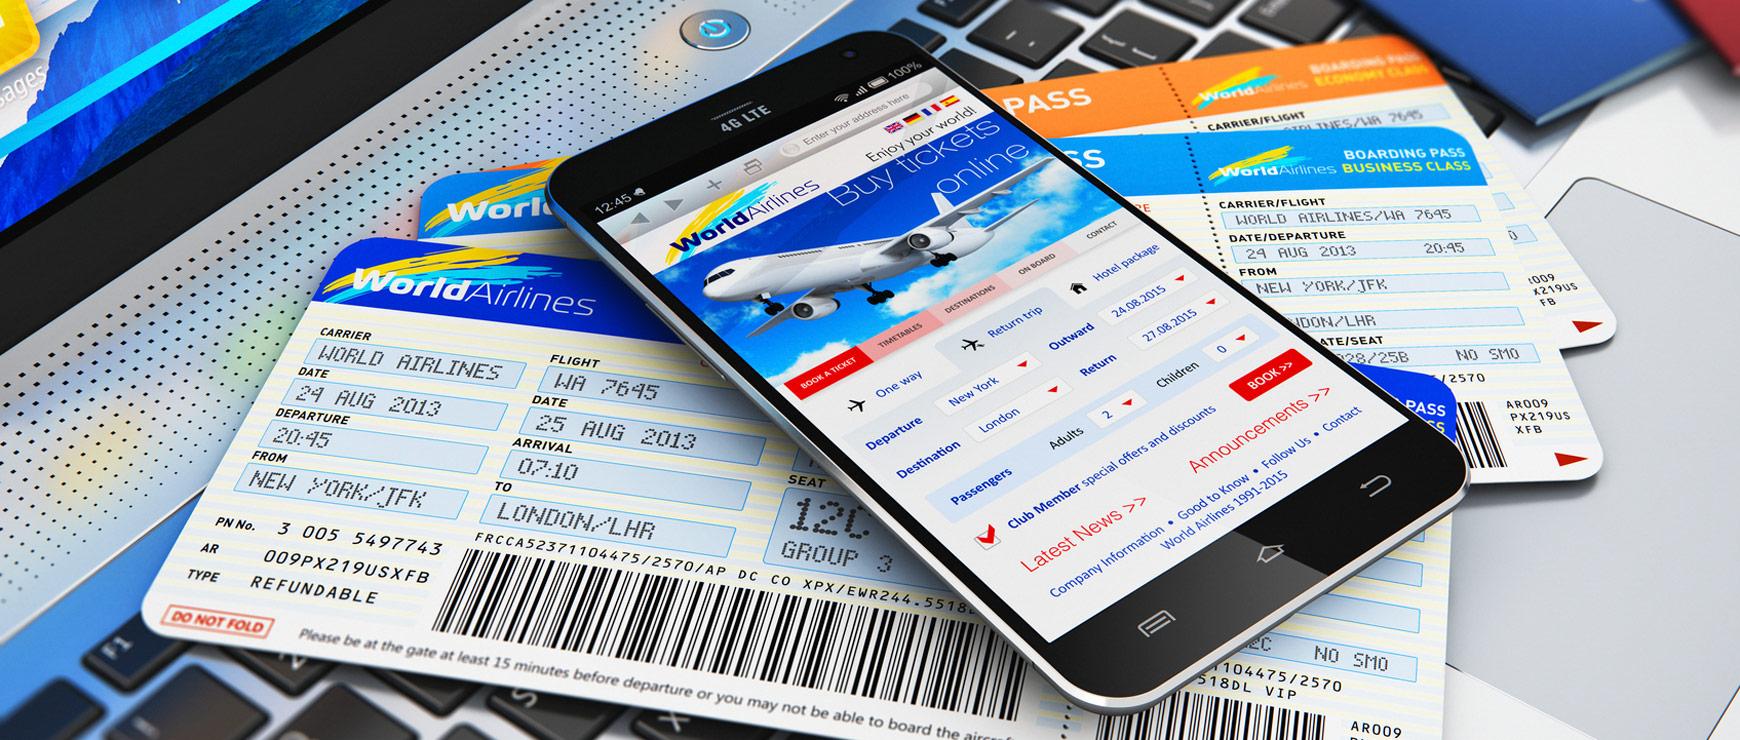 flight information on digital devices